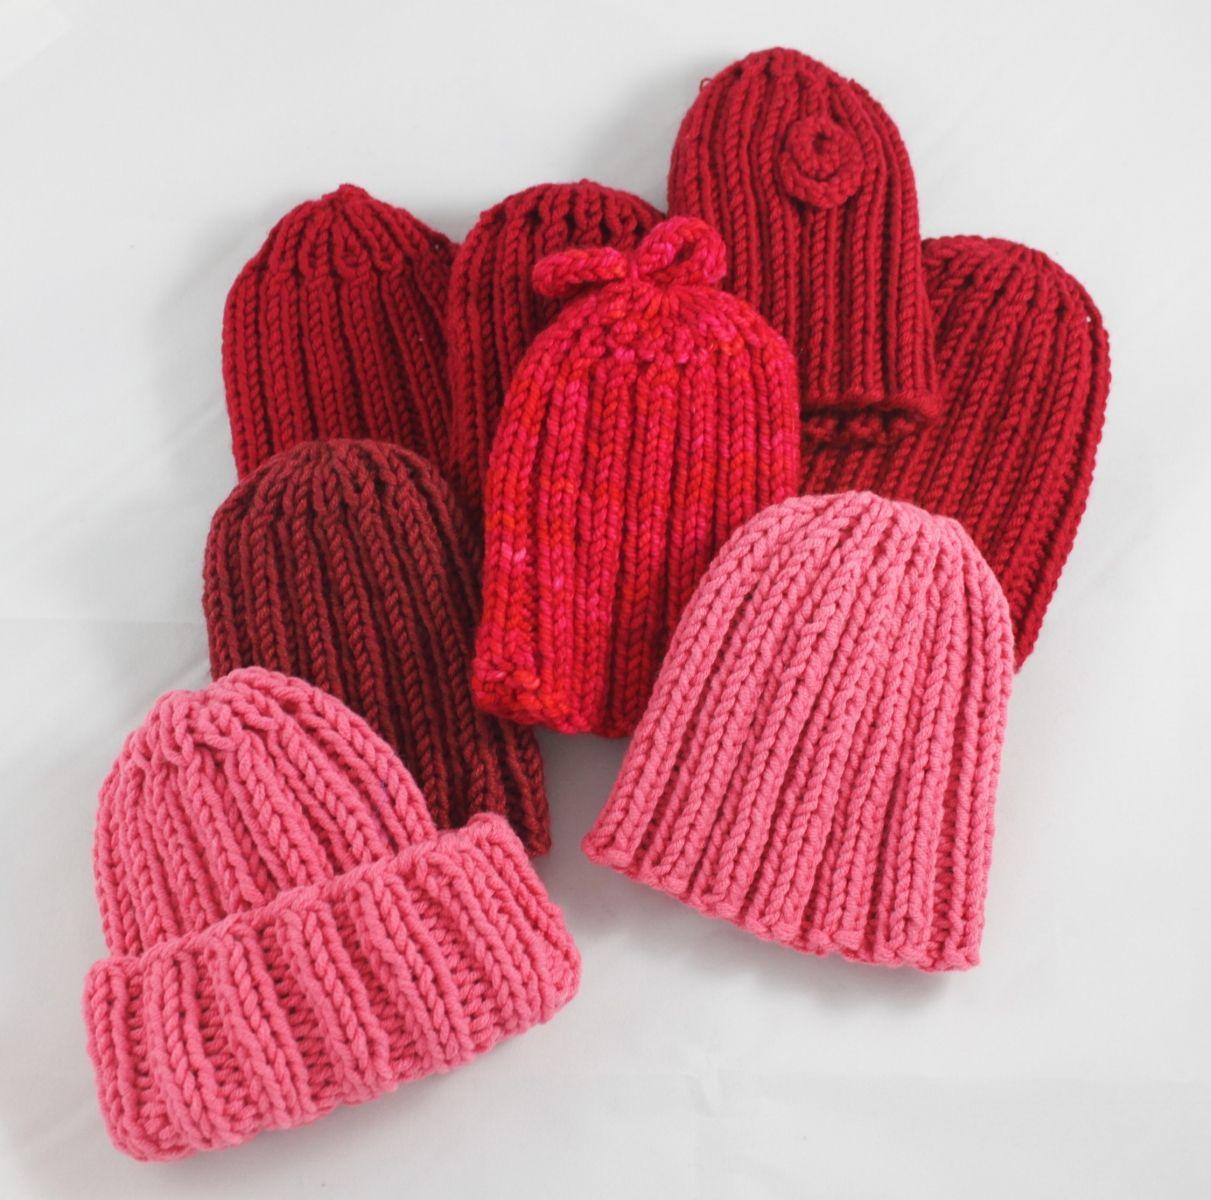 Little Hats, Big Hearts - Knitted Hat Pattern - FREE   Shaina Bilow ...